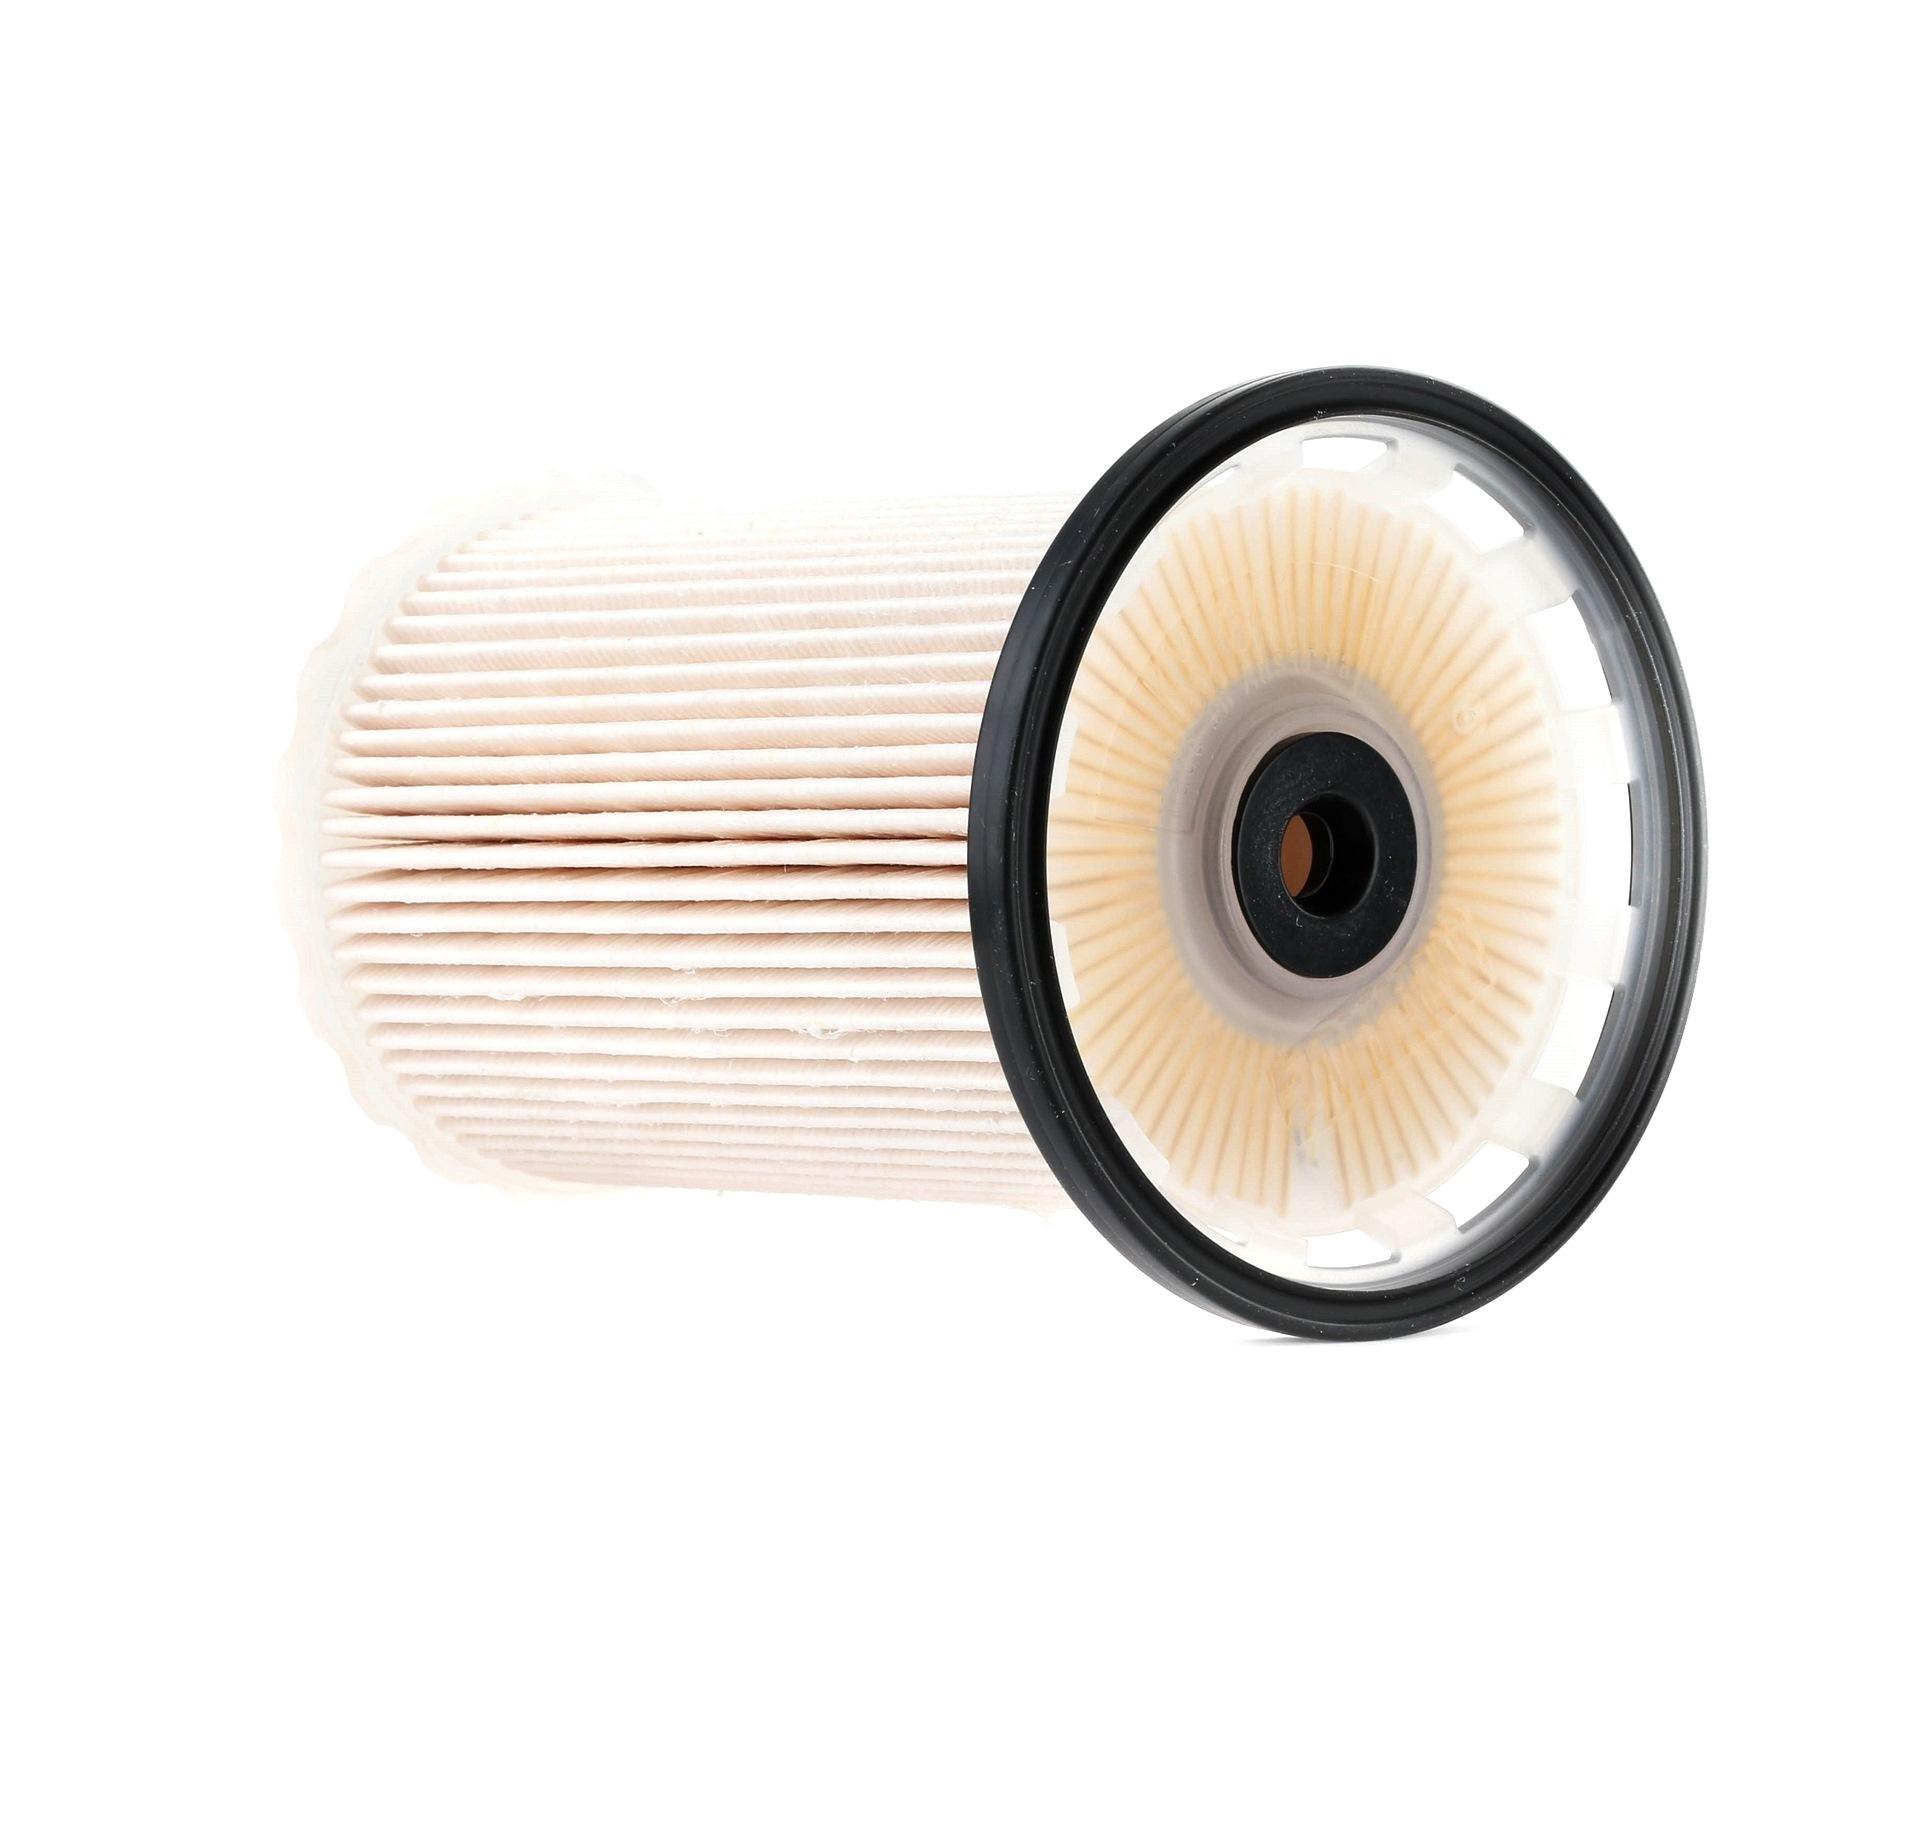 79930341 MAHLE ORIGINAL Filterinsats H: 123mm Bränslefilter KX 341 köp lågt pris